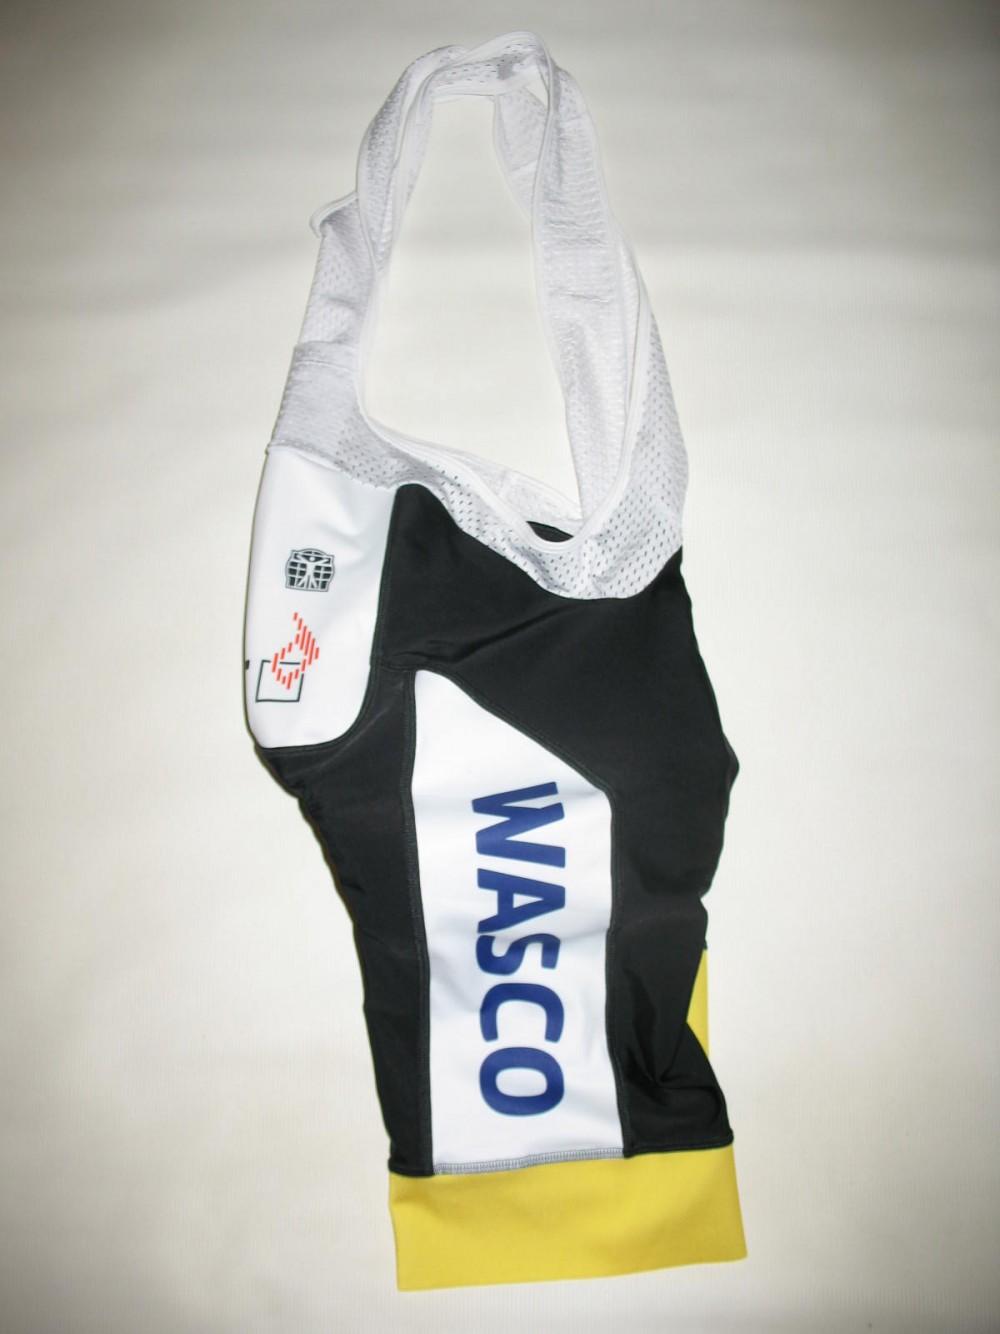 Велошорты BIORACER grundfos wasco bib cycling shorts (размер 4-XL/L) - 3